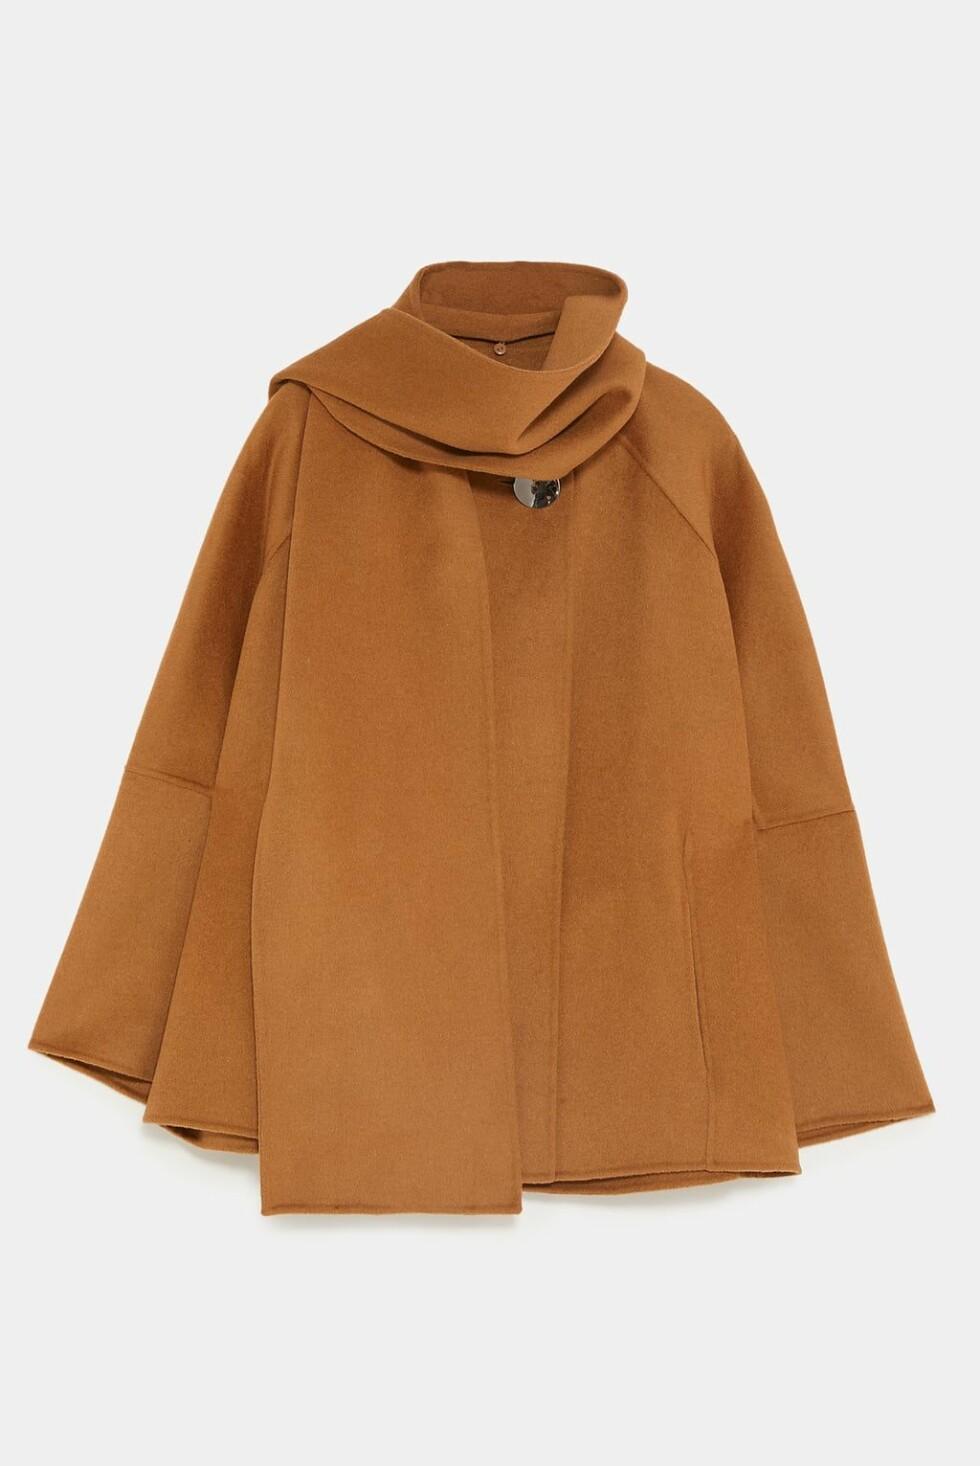 Zara |1199,-| https://www.zara.com/no/no/kappek%C3%A5pe-med-skjerf-p07522247.html?v1=7435519&v2=1074615